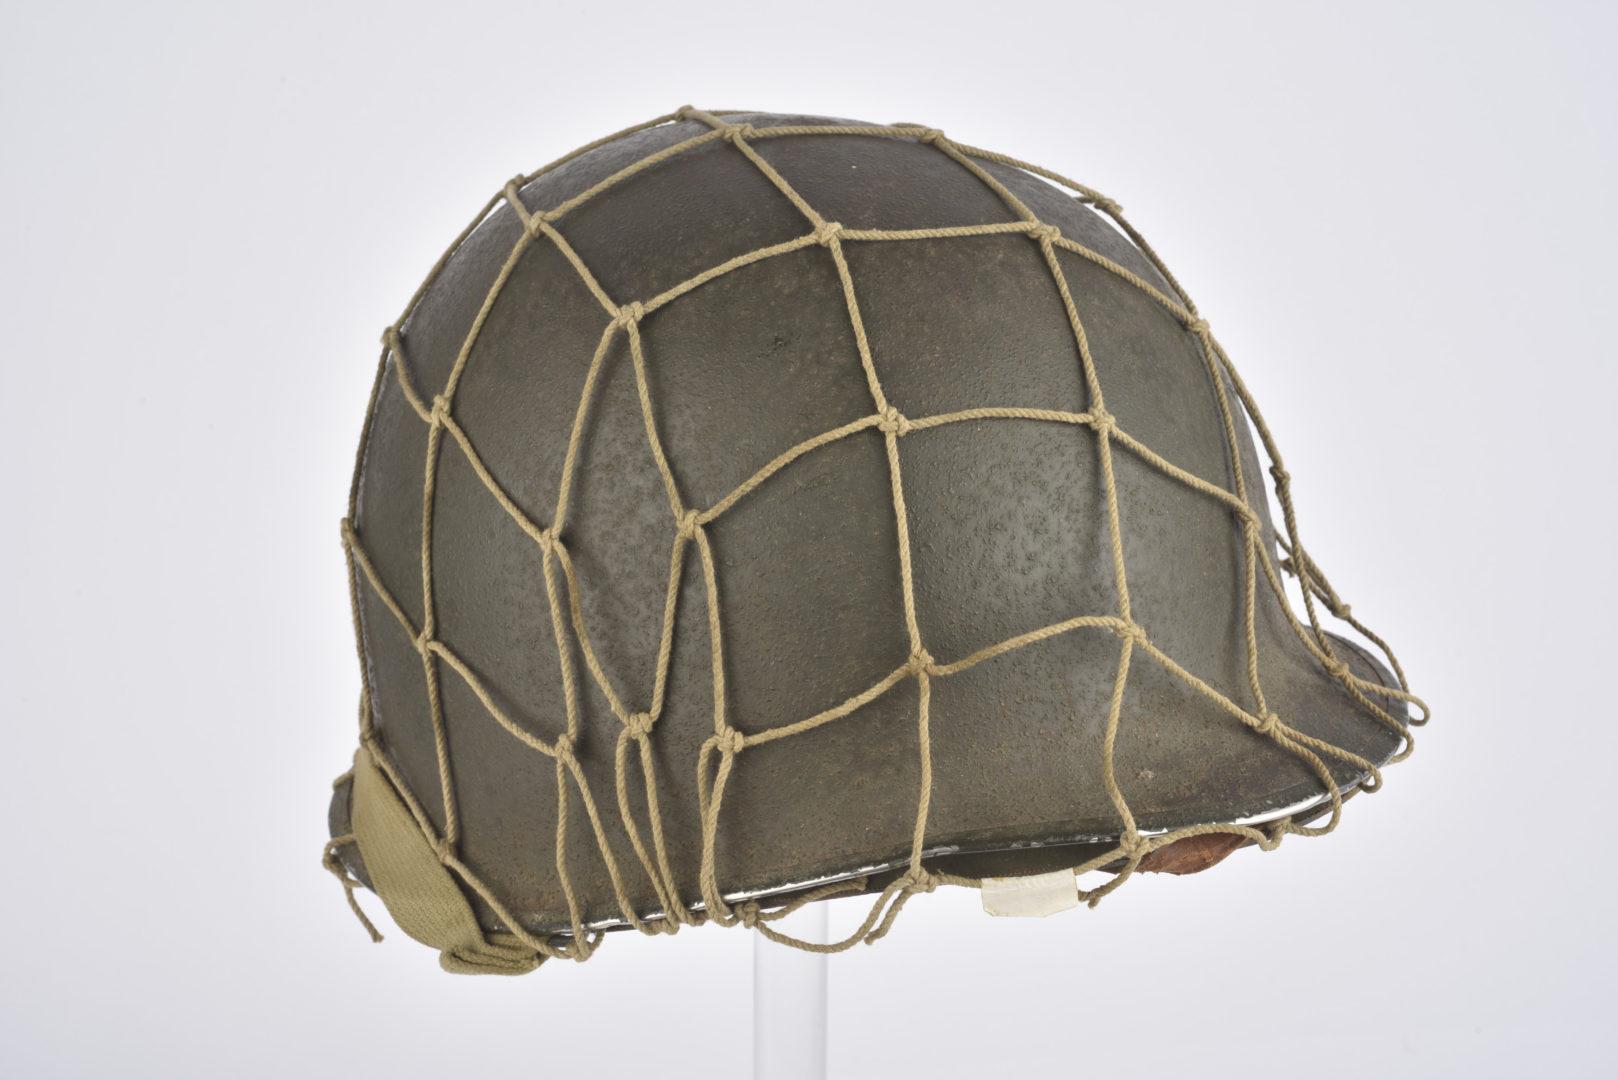 Casque usm1 avec filet de camouflage aiolfi gbr lightbox altavistaventures Choice Image